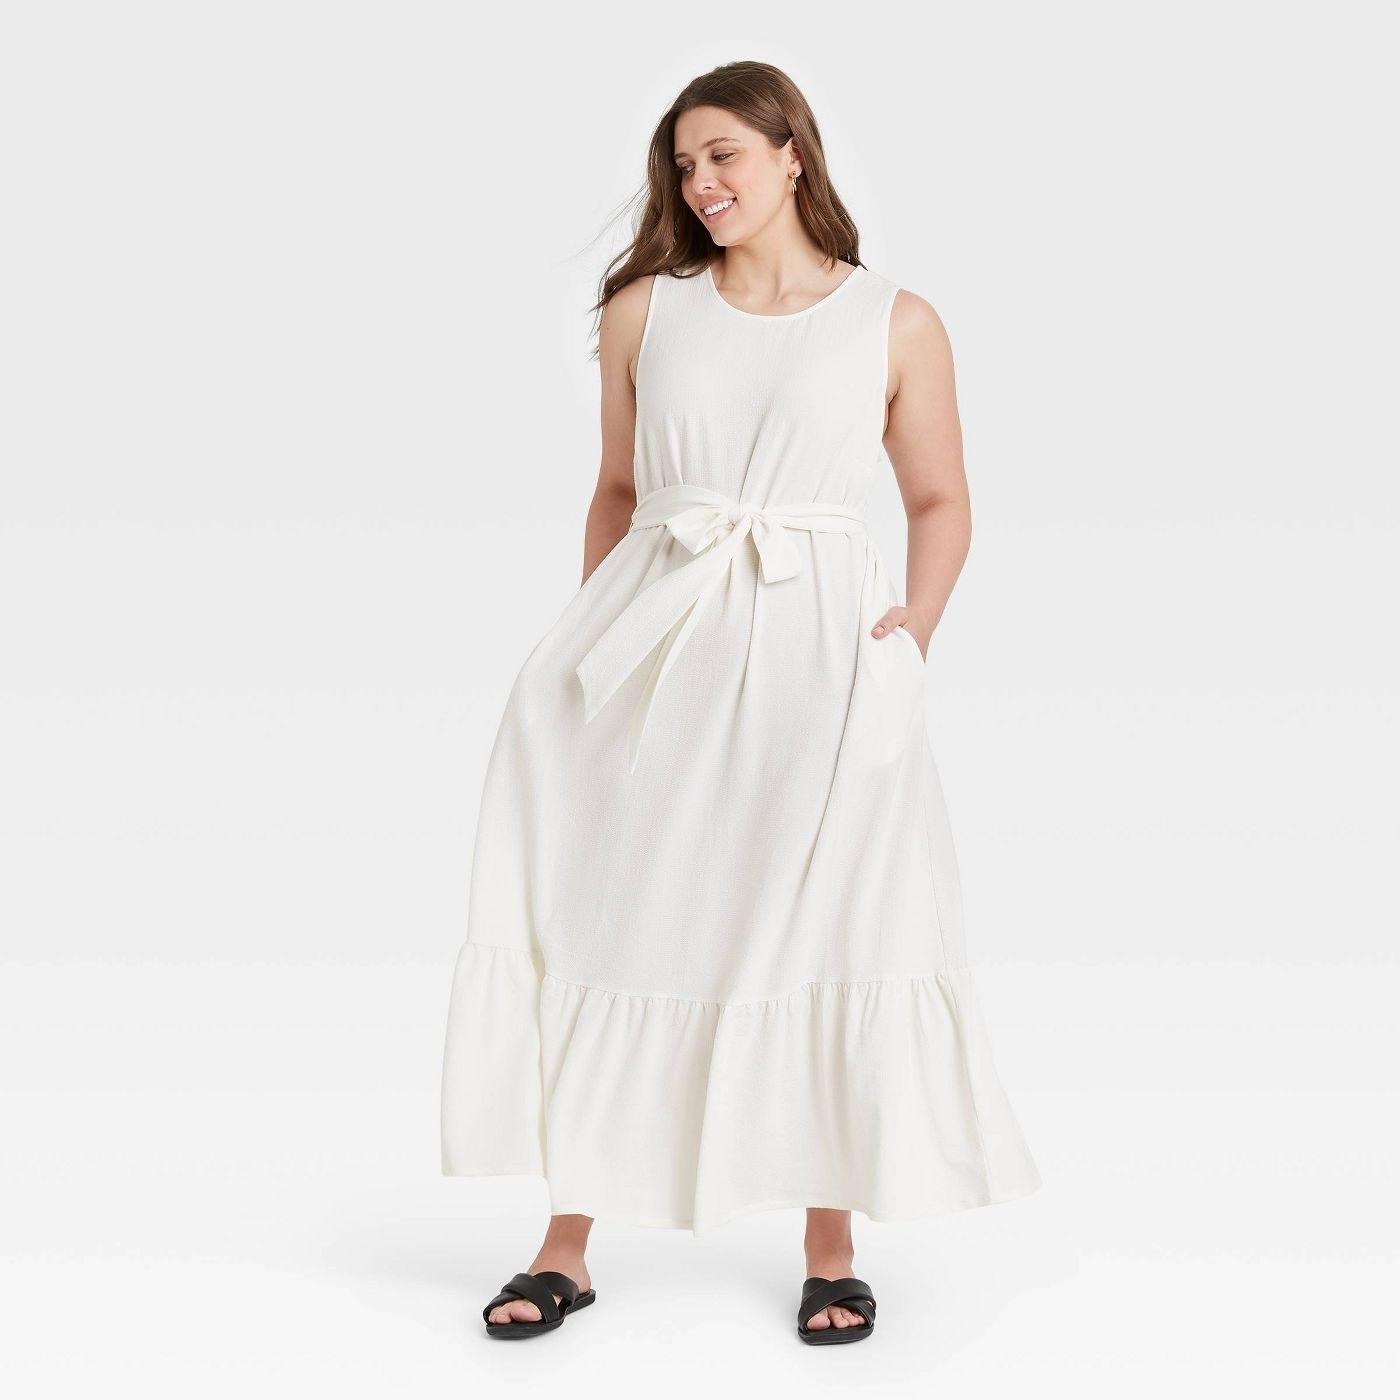 Model wearing white maxi dress with ruffle hem